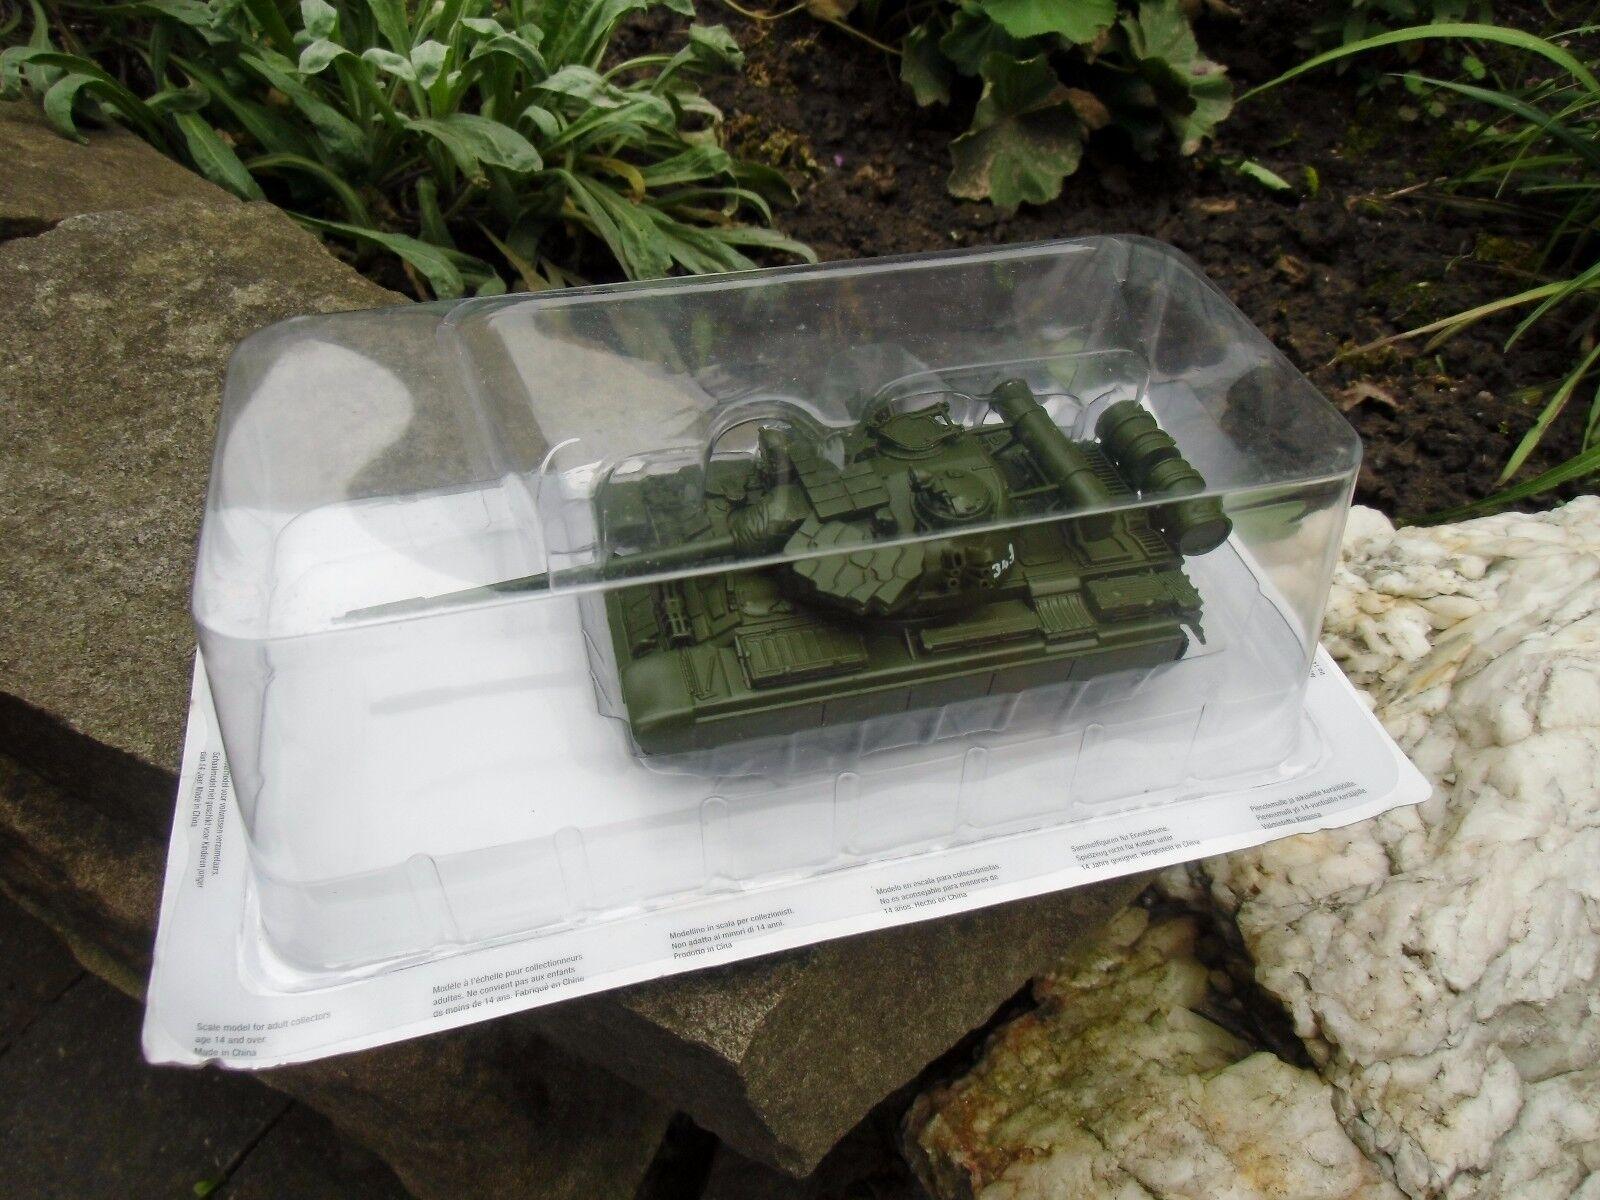 007 james bond - tank t-55 - Goldeneye - 1  50 boxed modell besonders selten.